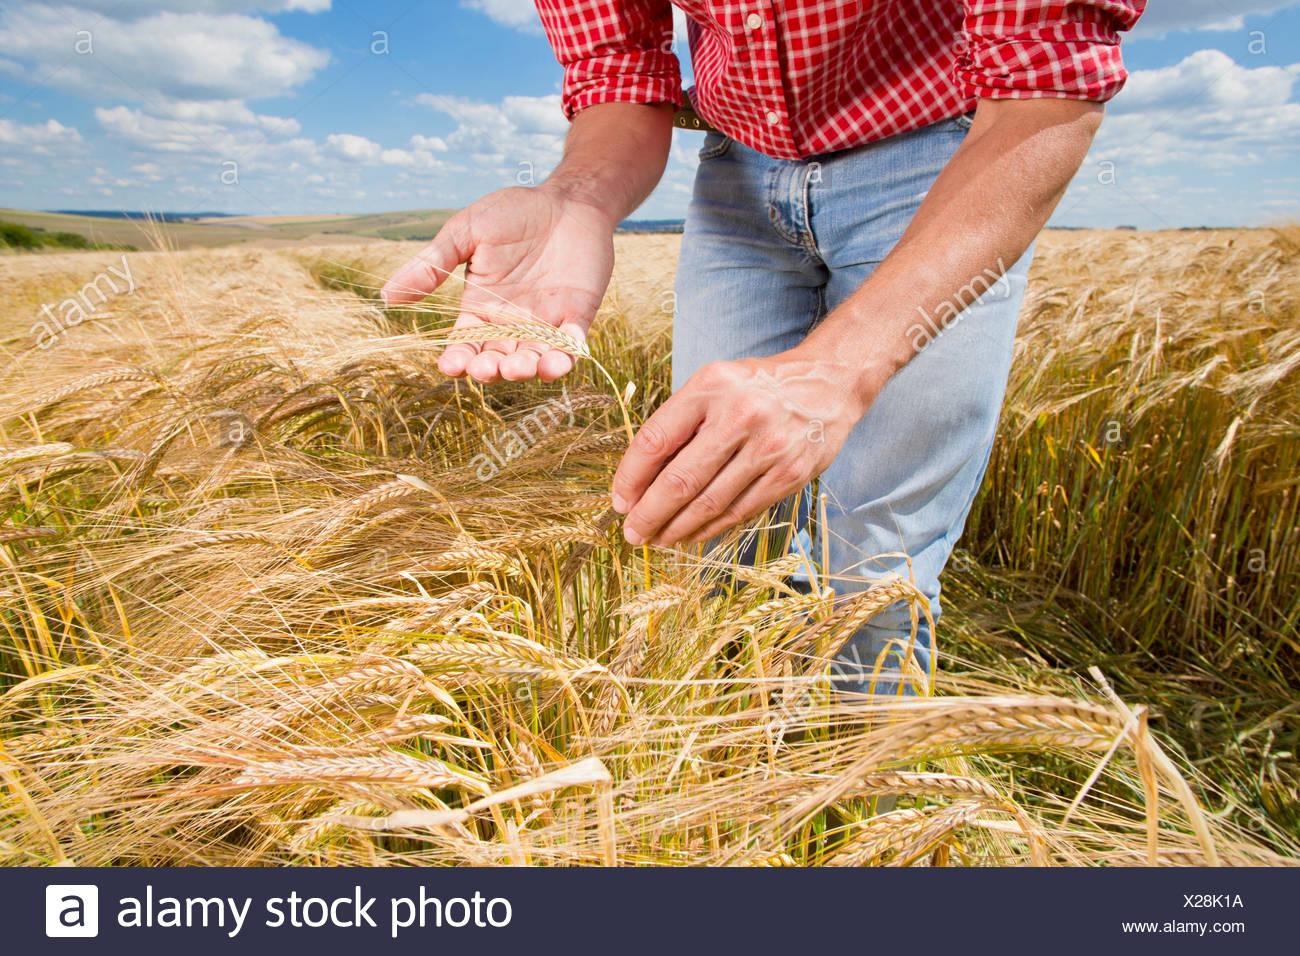 Close up farmer examining sunny rural barley crop field in summer - Stock Image